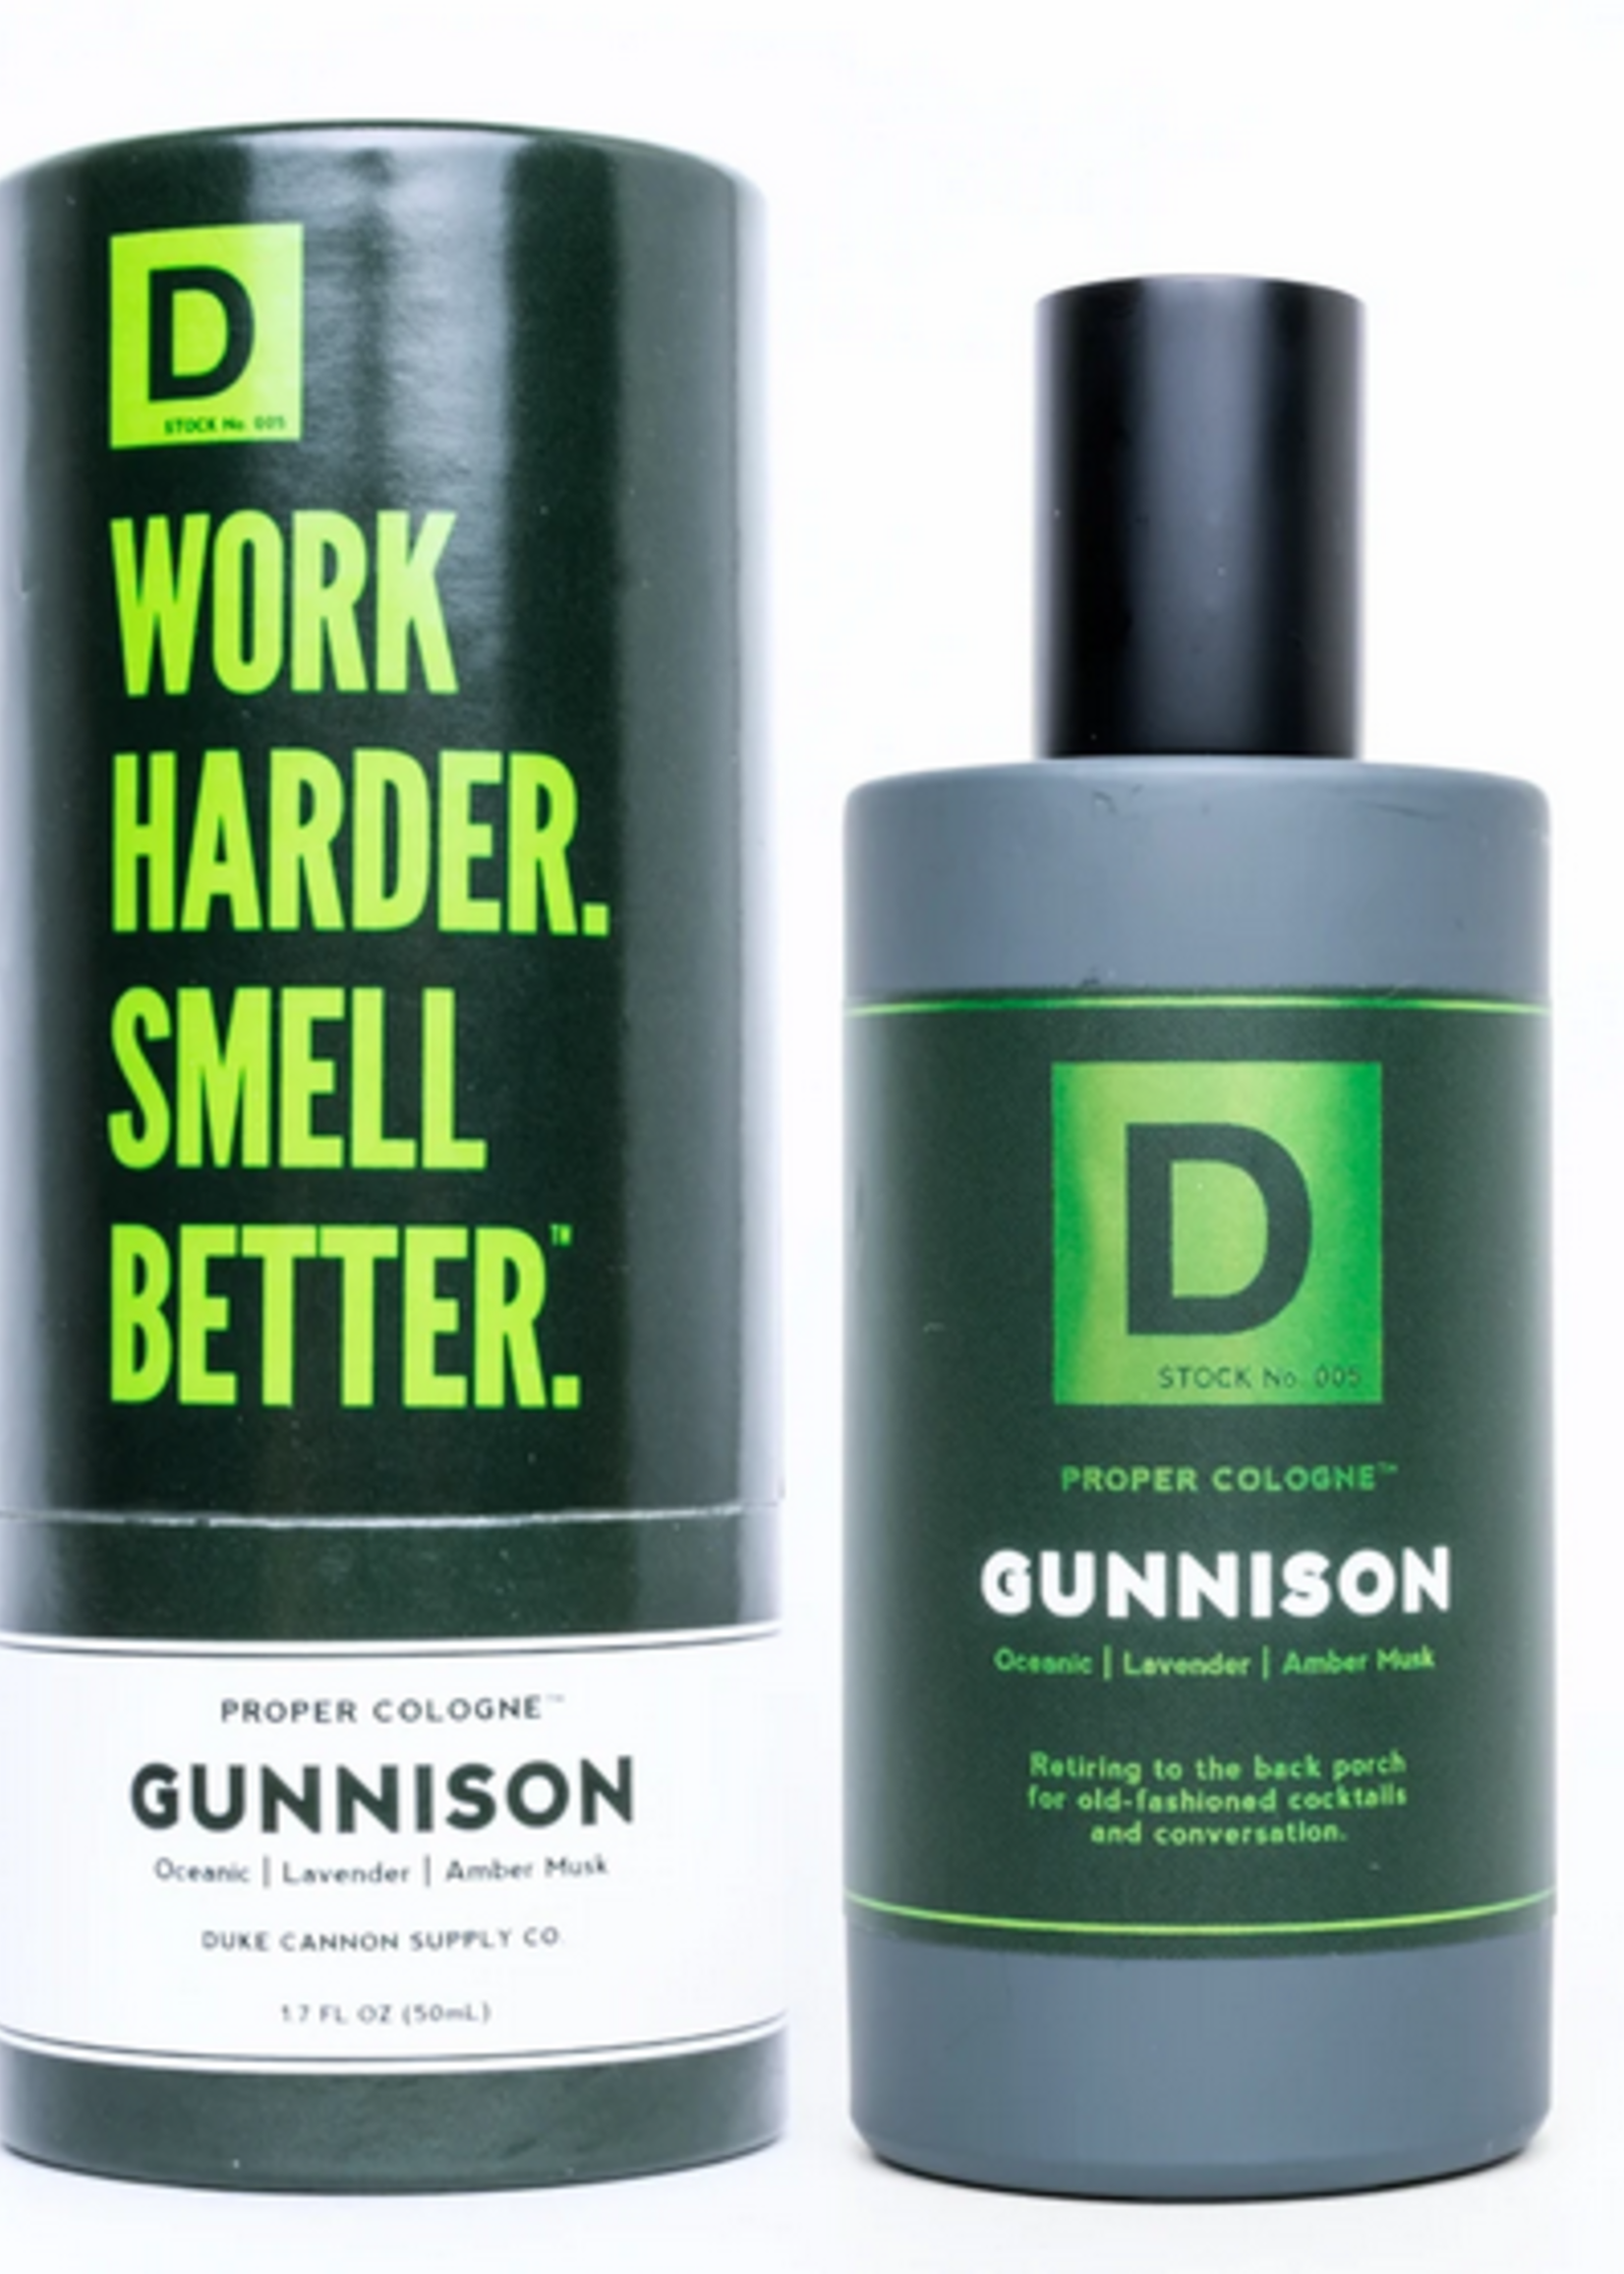 Duke Cannon Gunnison Proper Cologne